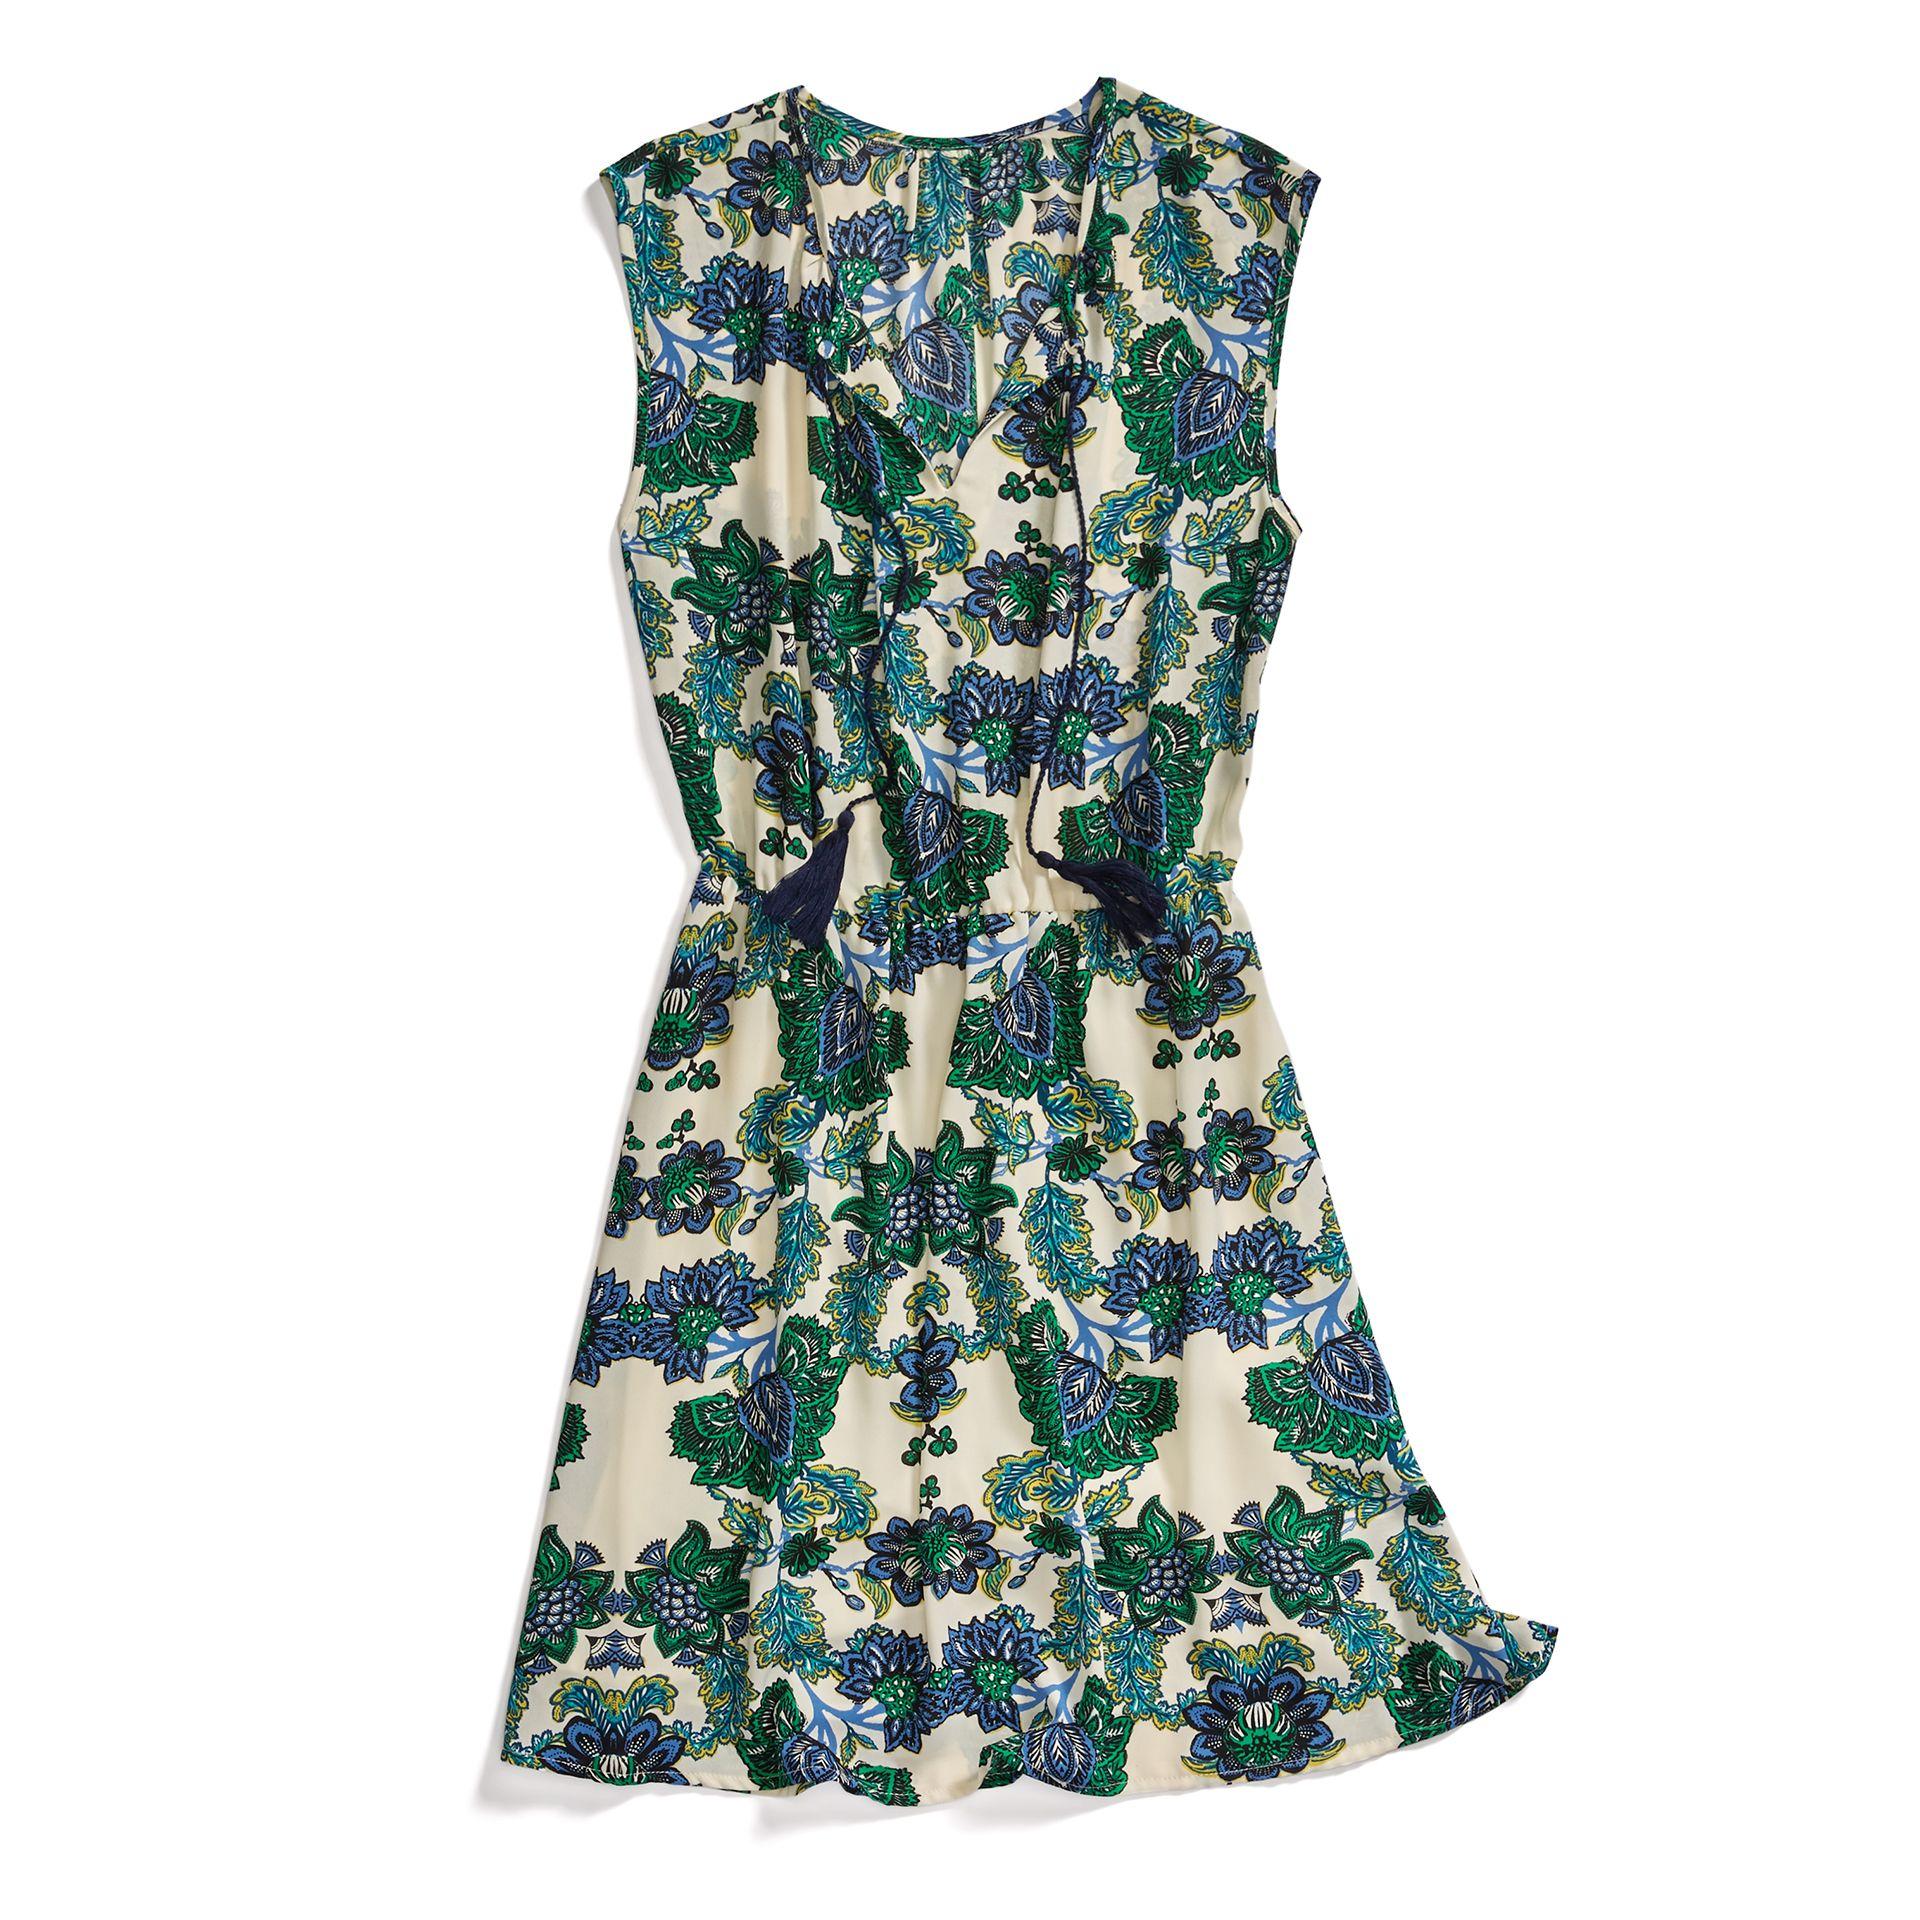 Stitch Fix Spring Trends 2016   Stylist Picks   Pinterest ...